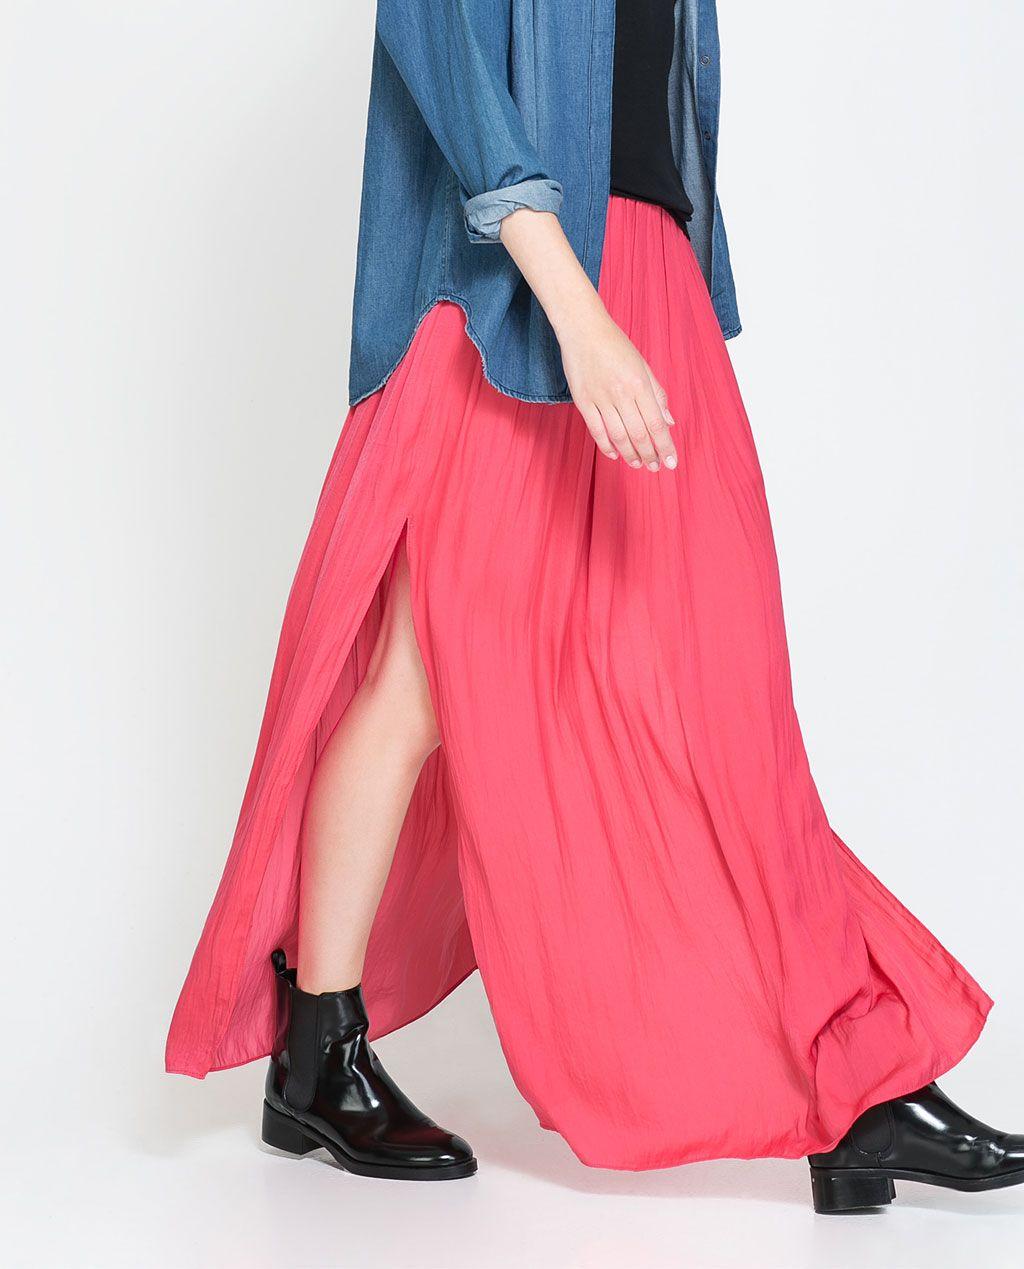 Long skirt with slits from zara style pinterest long skirts